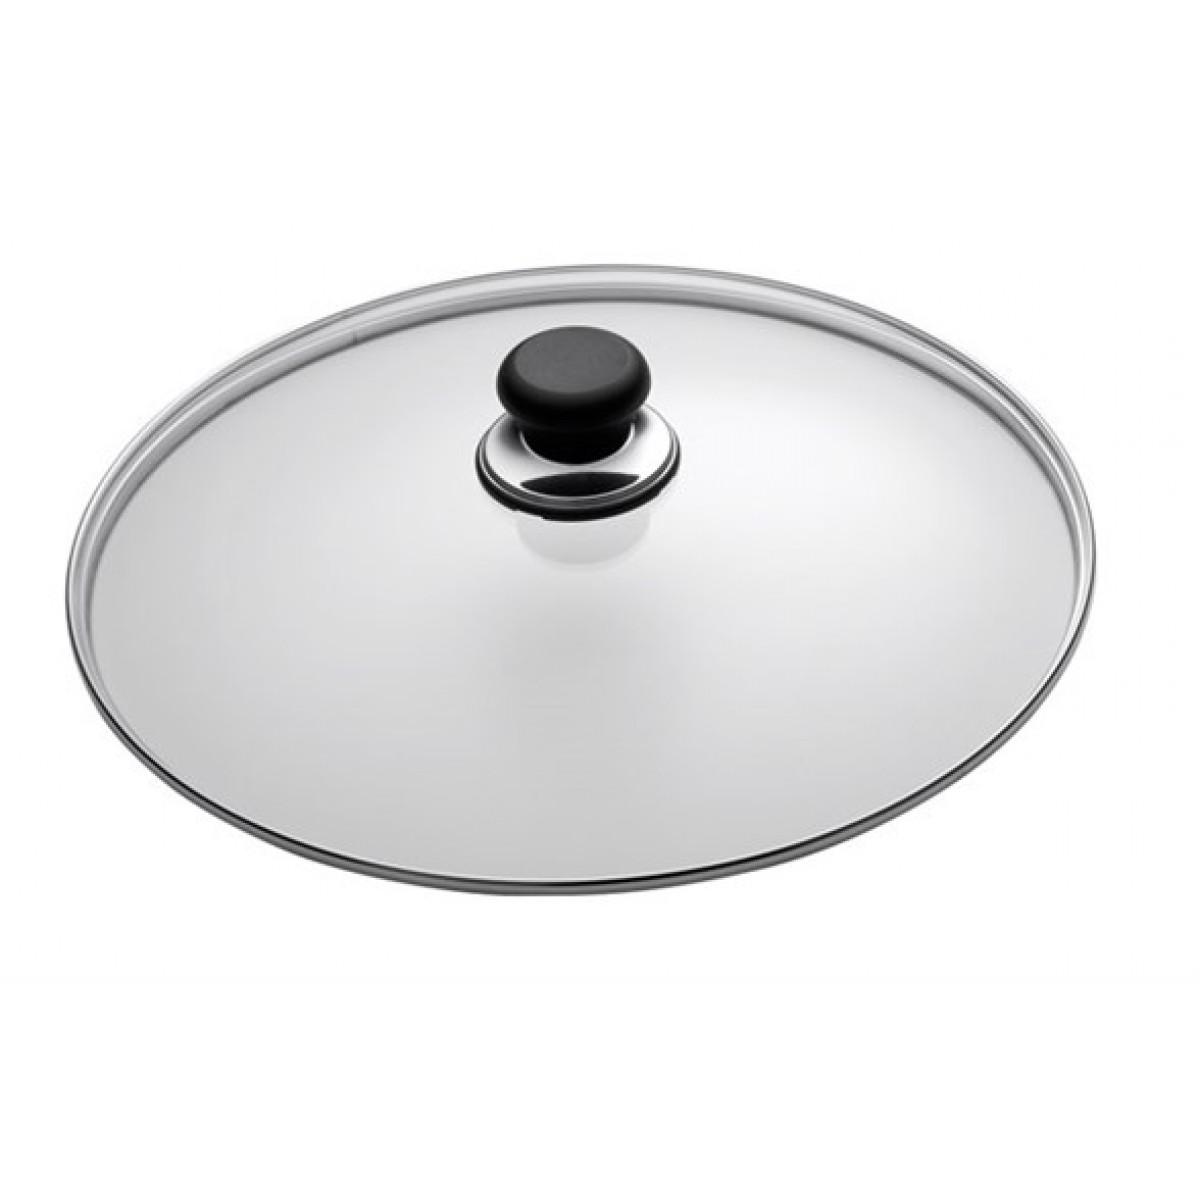 SCANPAN Glaslåg 18 cm classic